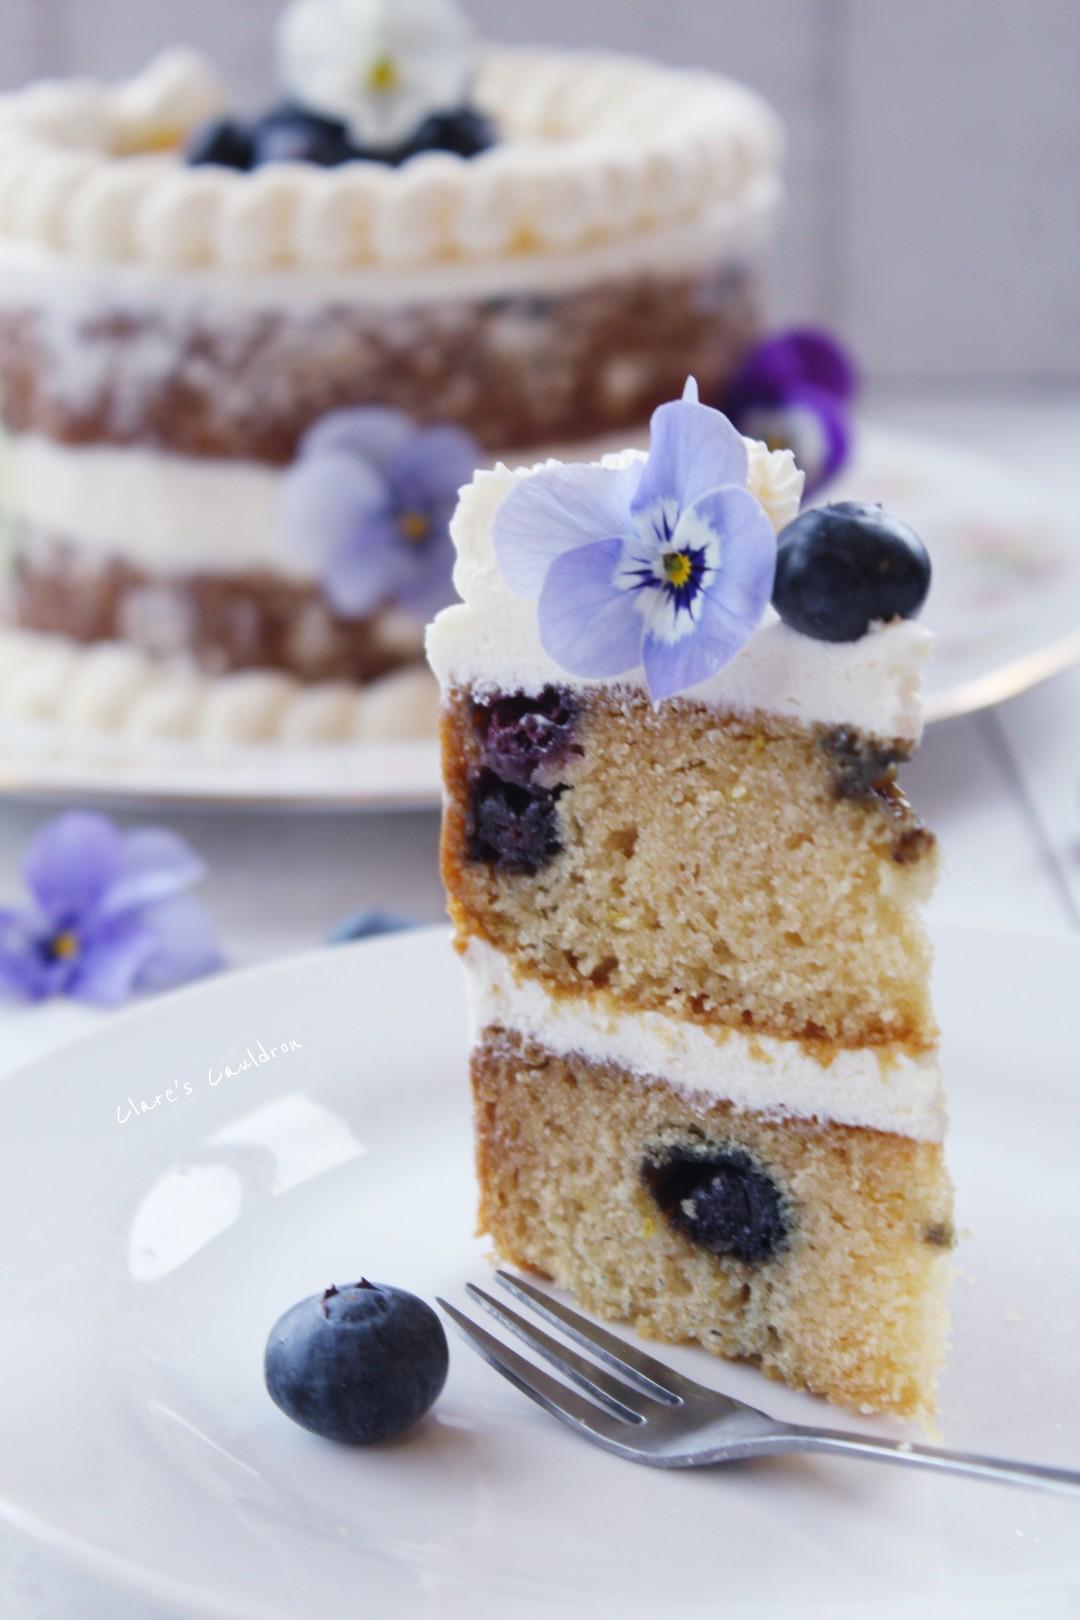 Lets Bake An Intolerance Lemon and BlueberryCake